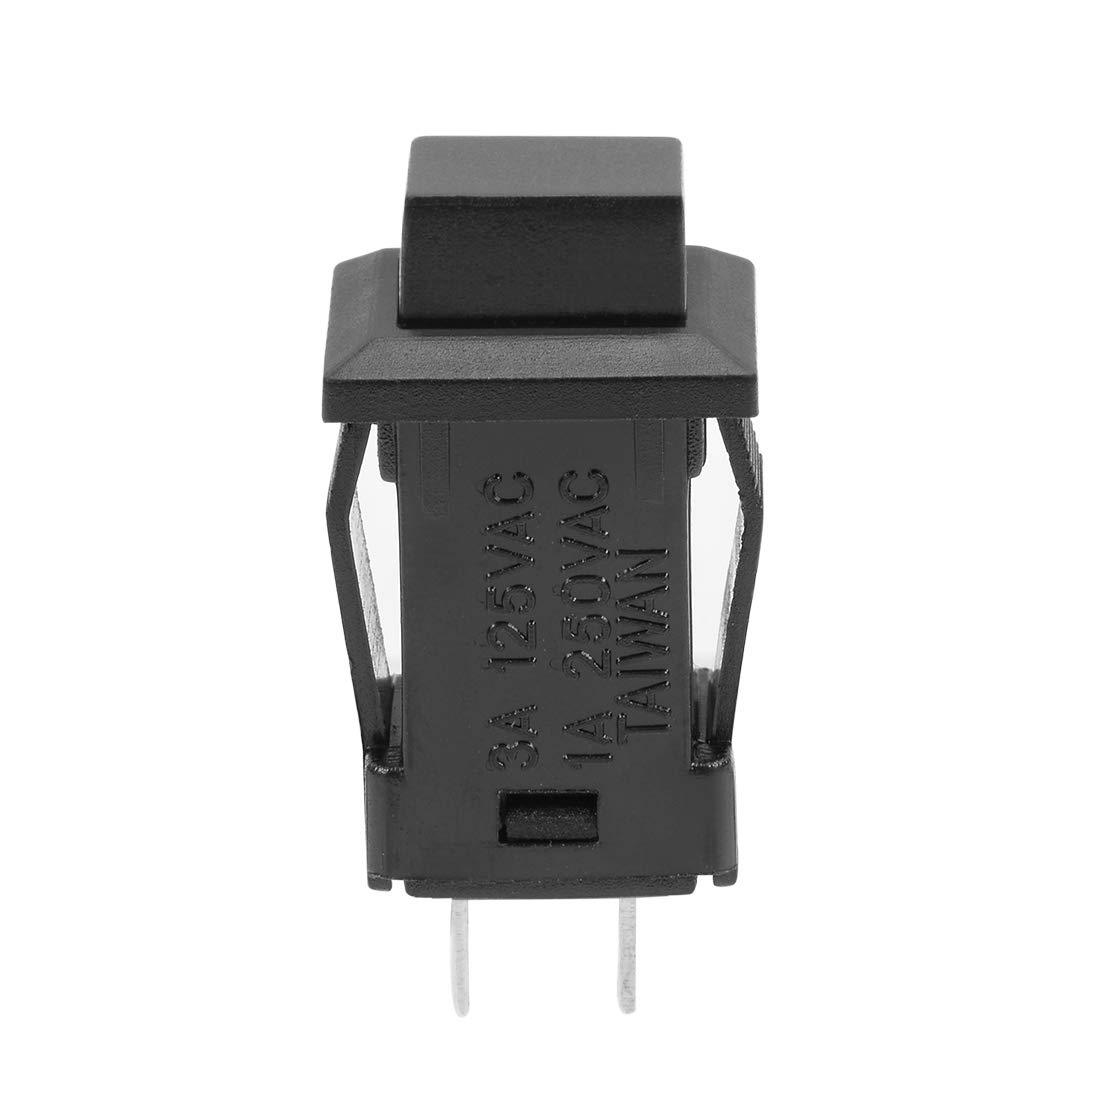 uxcell 5pcs 12mm Latching Type Mini Push Button Switch Black Button SPST NO